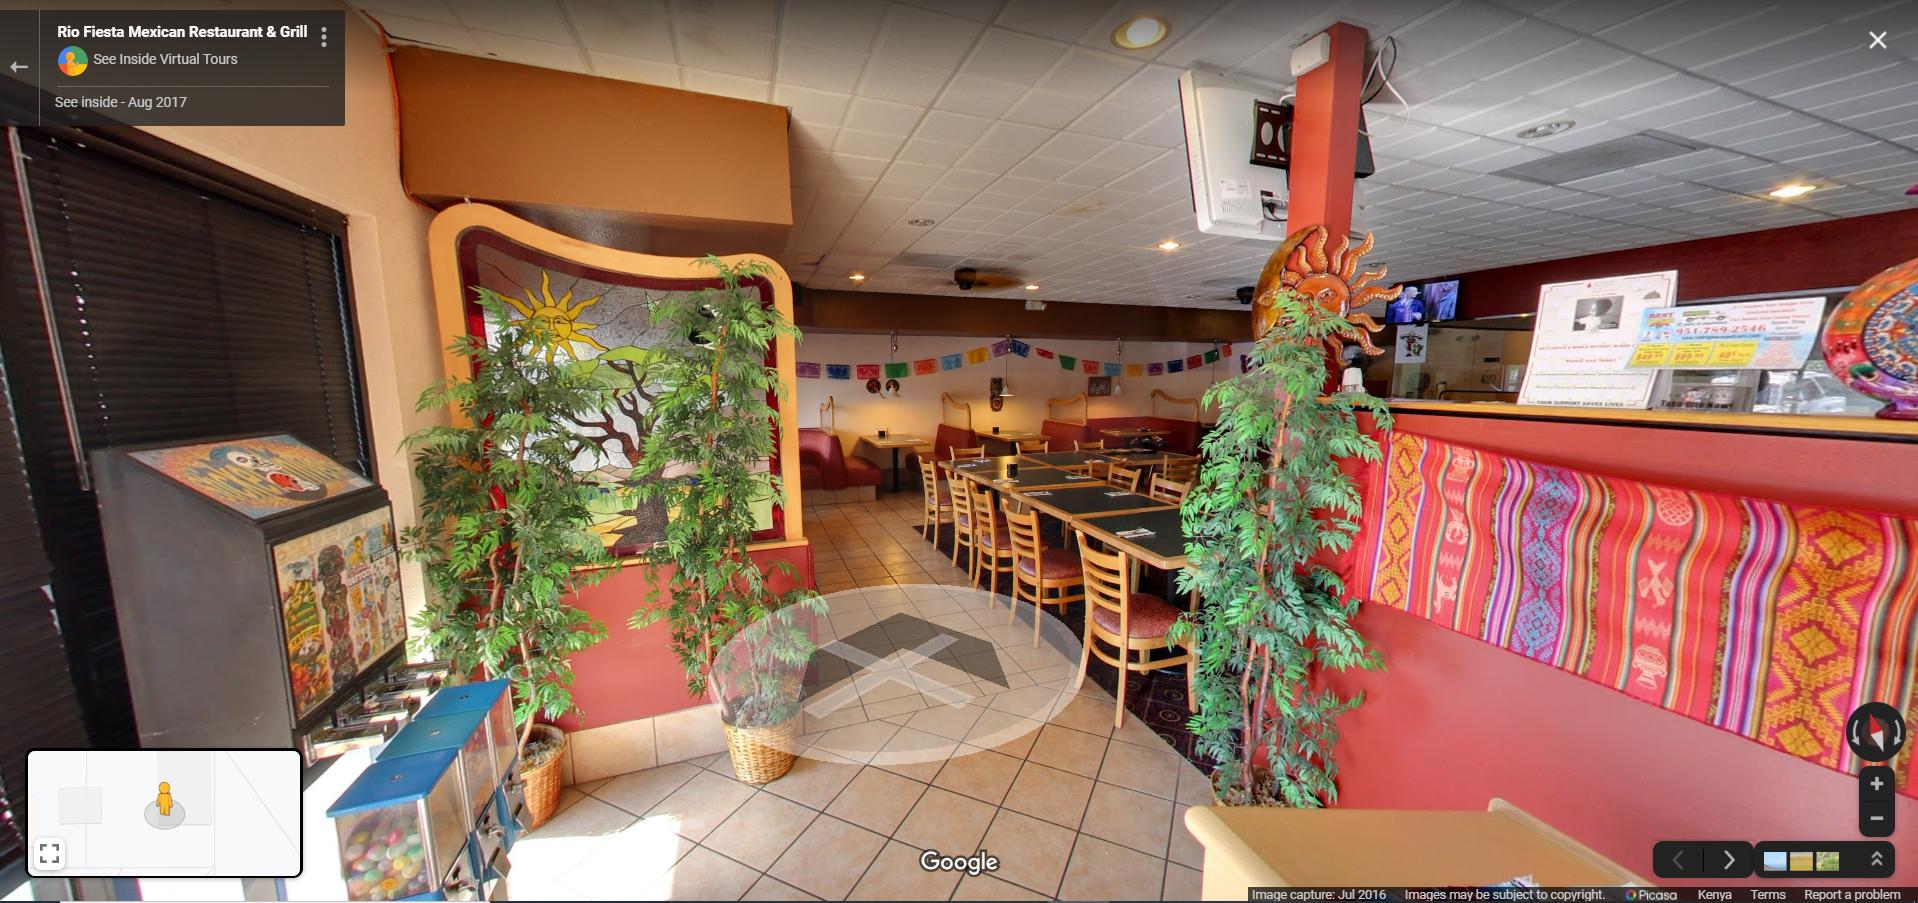 Rio Fiesta Mexican Restaurant & Grill - Riverside